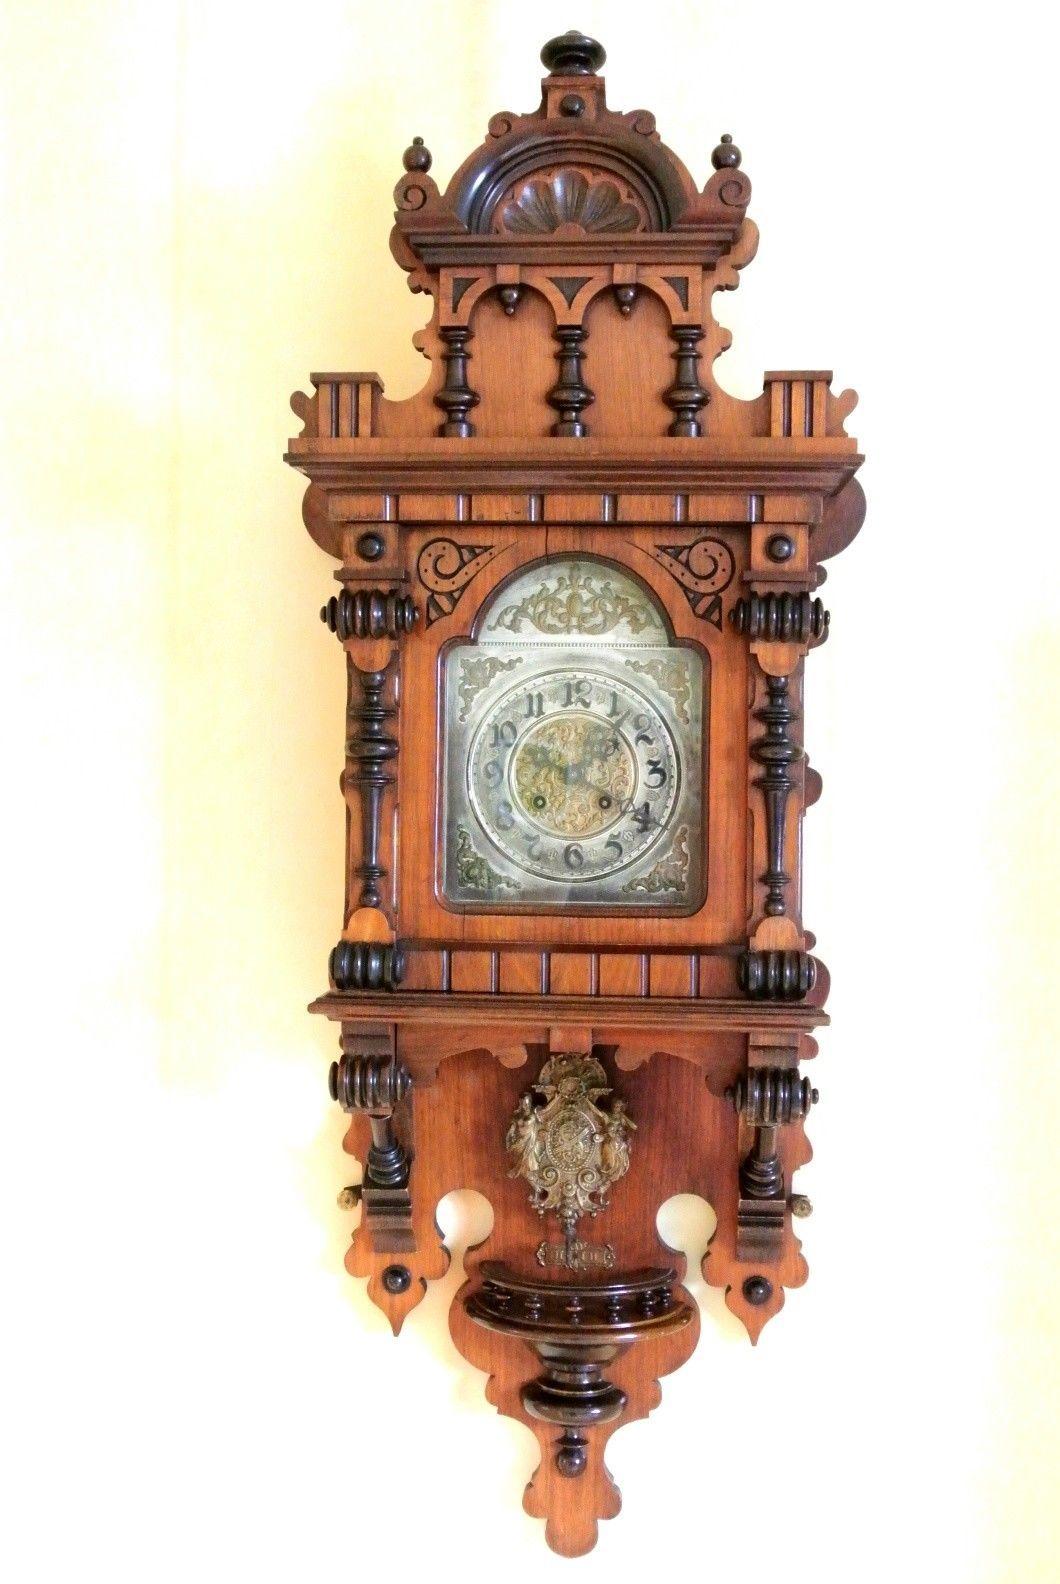 Gustav Becker Wanduhr Ca 1897 Regulator Freischwinger Pendeluhr Schlagwerk 118cm Antiquitäten Kunst Mobiliar Interieur Uhre Настенные часы Часы Заколки